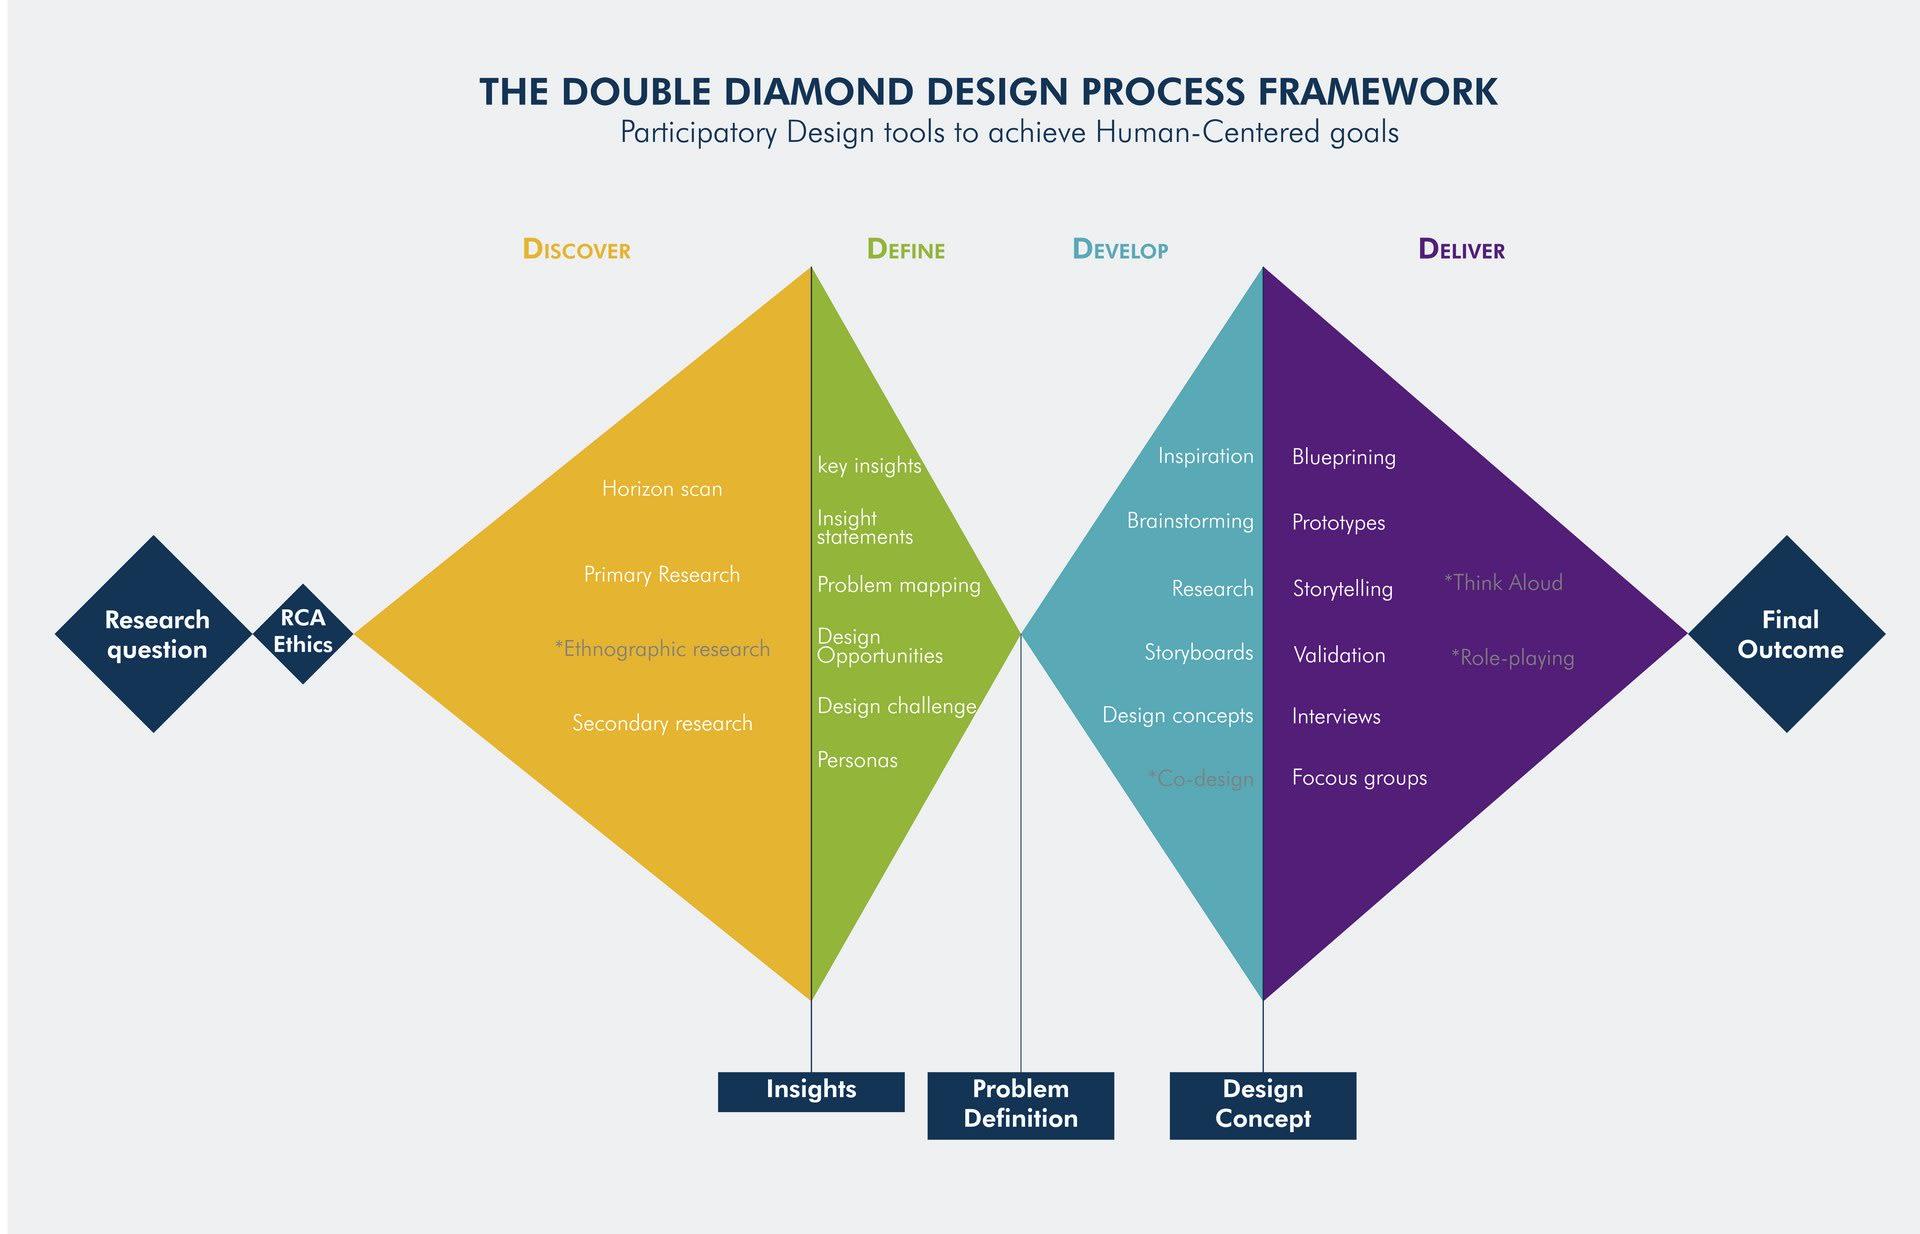 _The Double Diamond Design Process